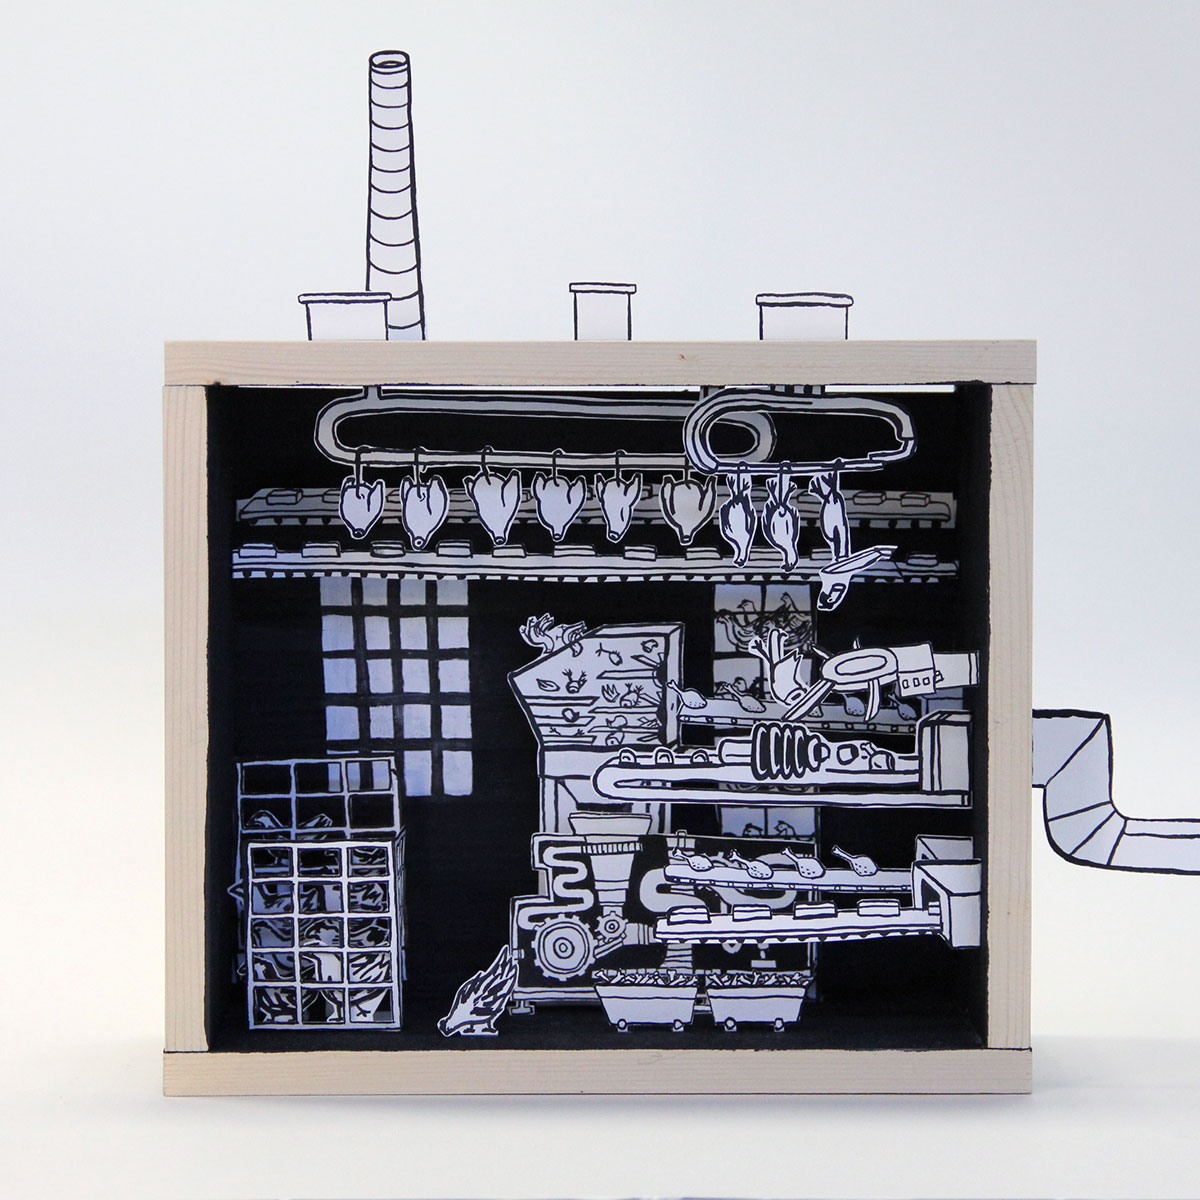 2016_Papercut_3D_Woodbox_Farming_Doro_Spiro